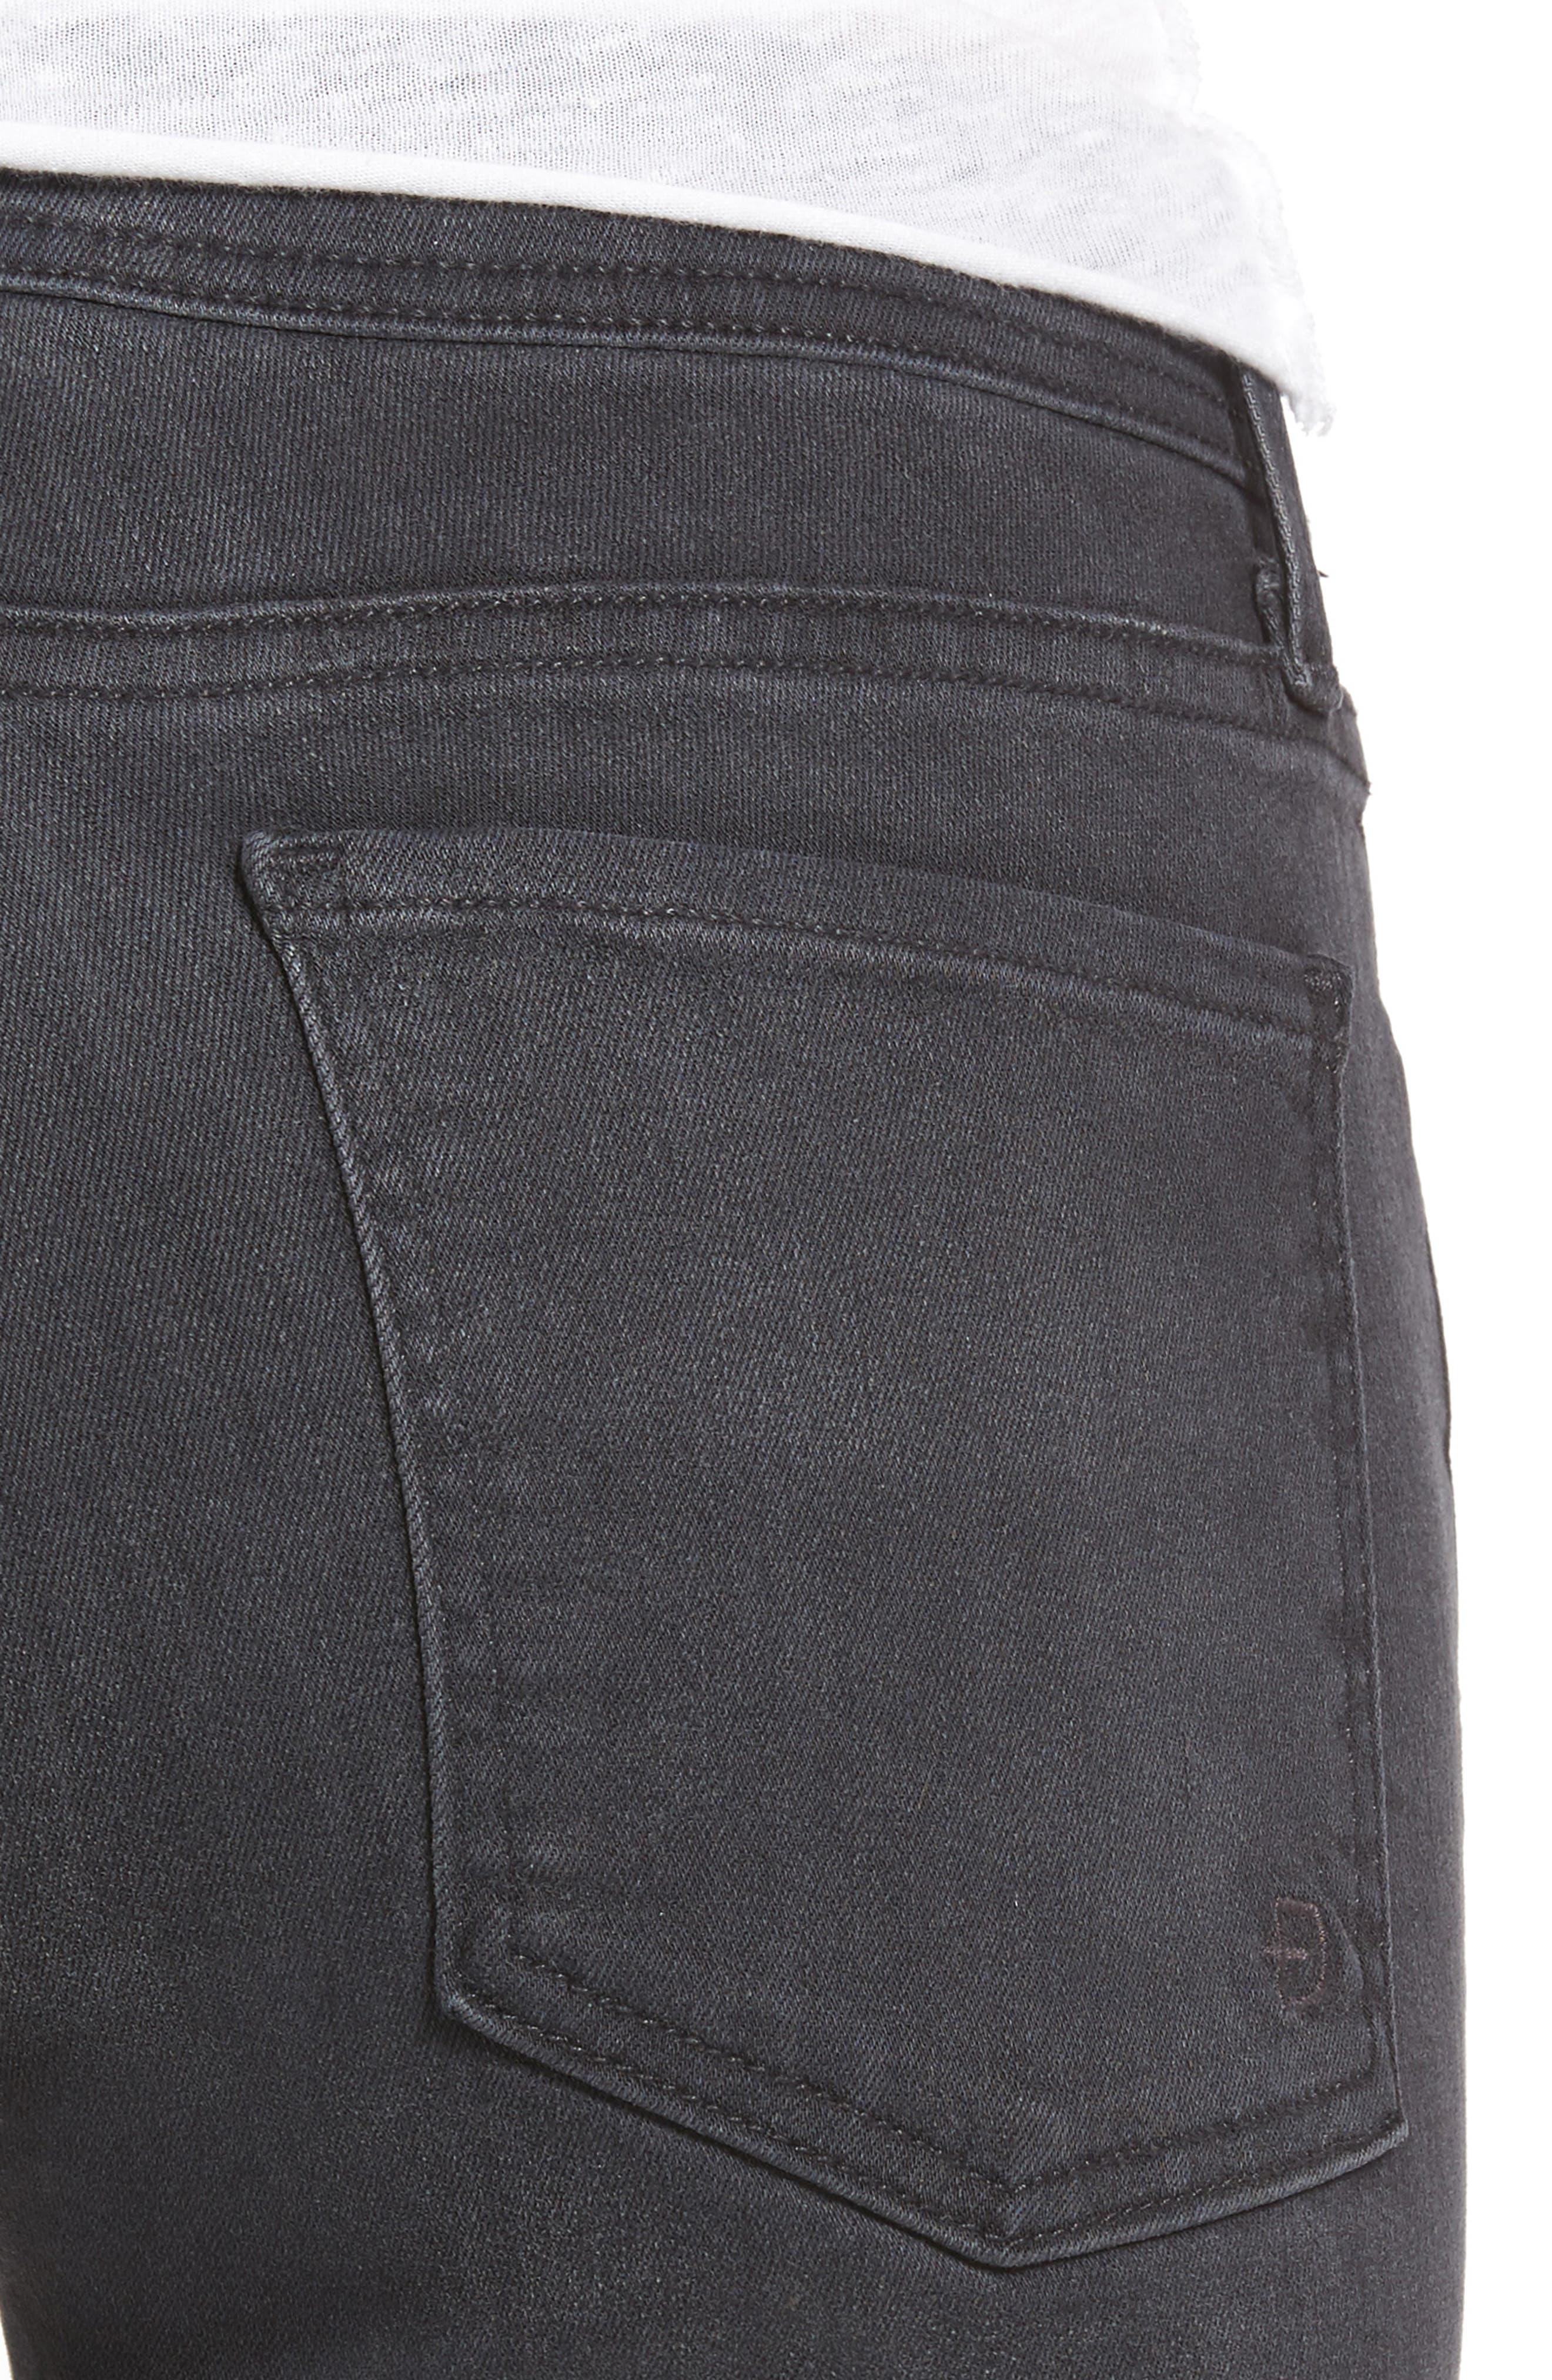 Belvedere Skinny Jeans,                             Alternate thumbnail 4, color,                             001